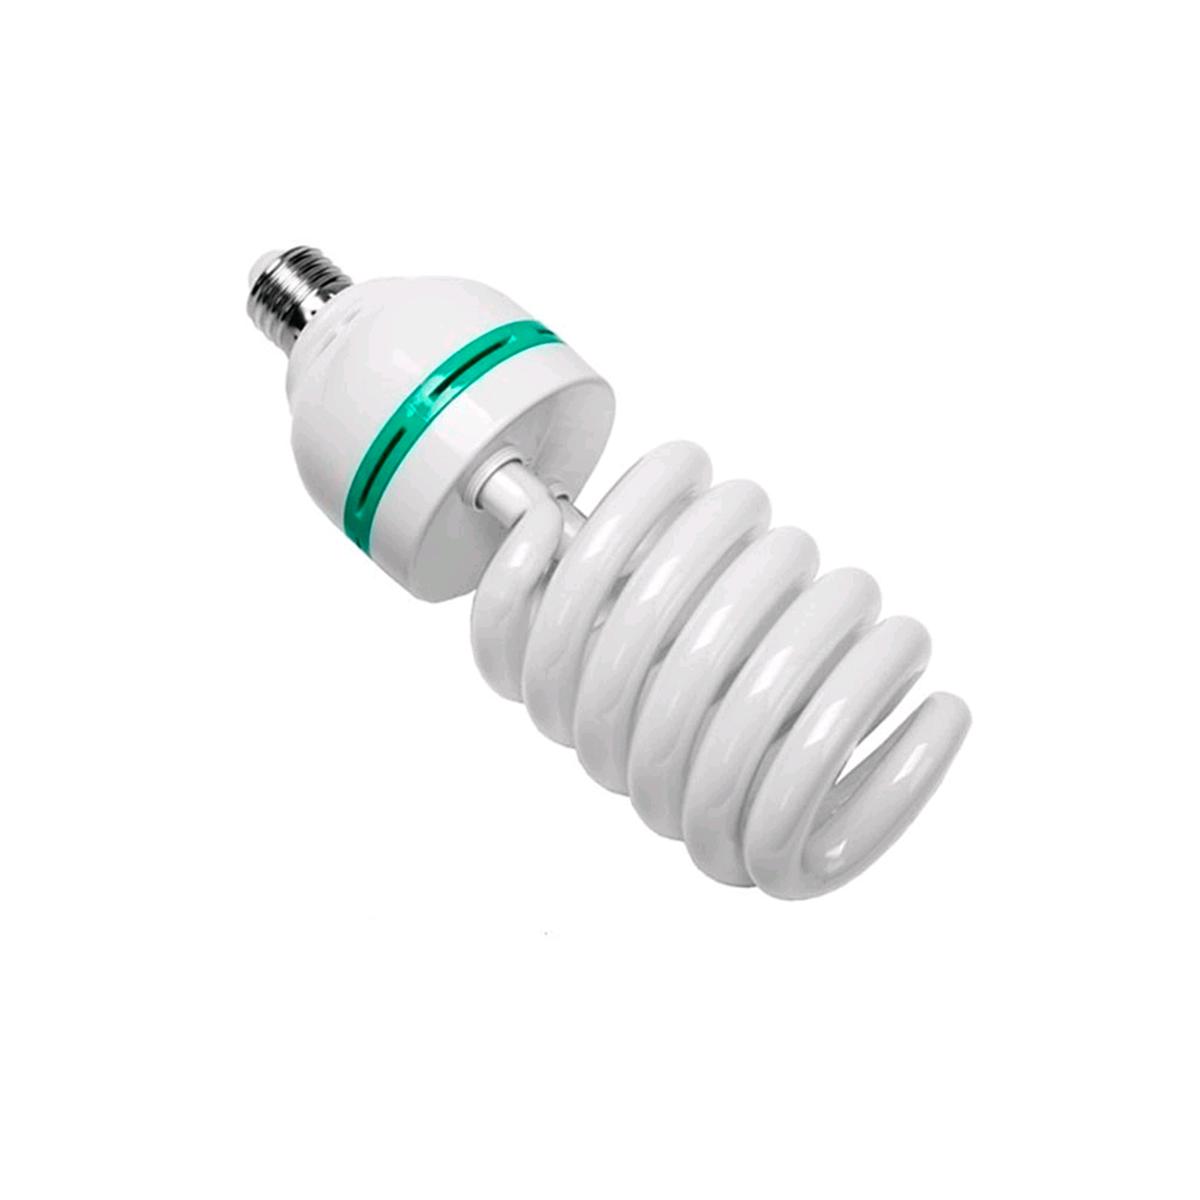 Lâmpada Fluorescente Greika 135 Watts 5500K  - Fotolux